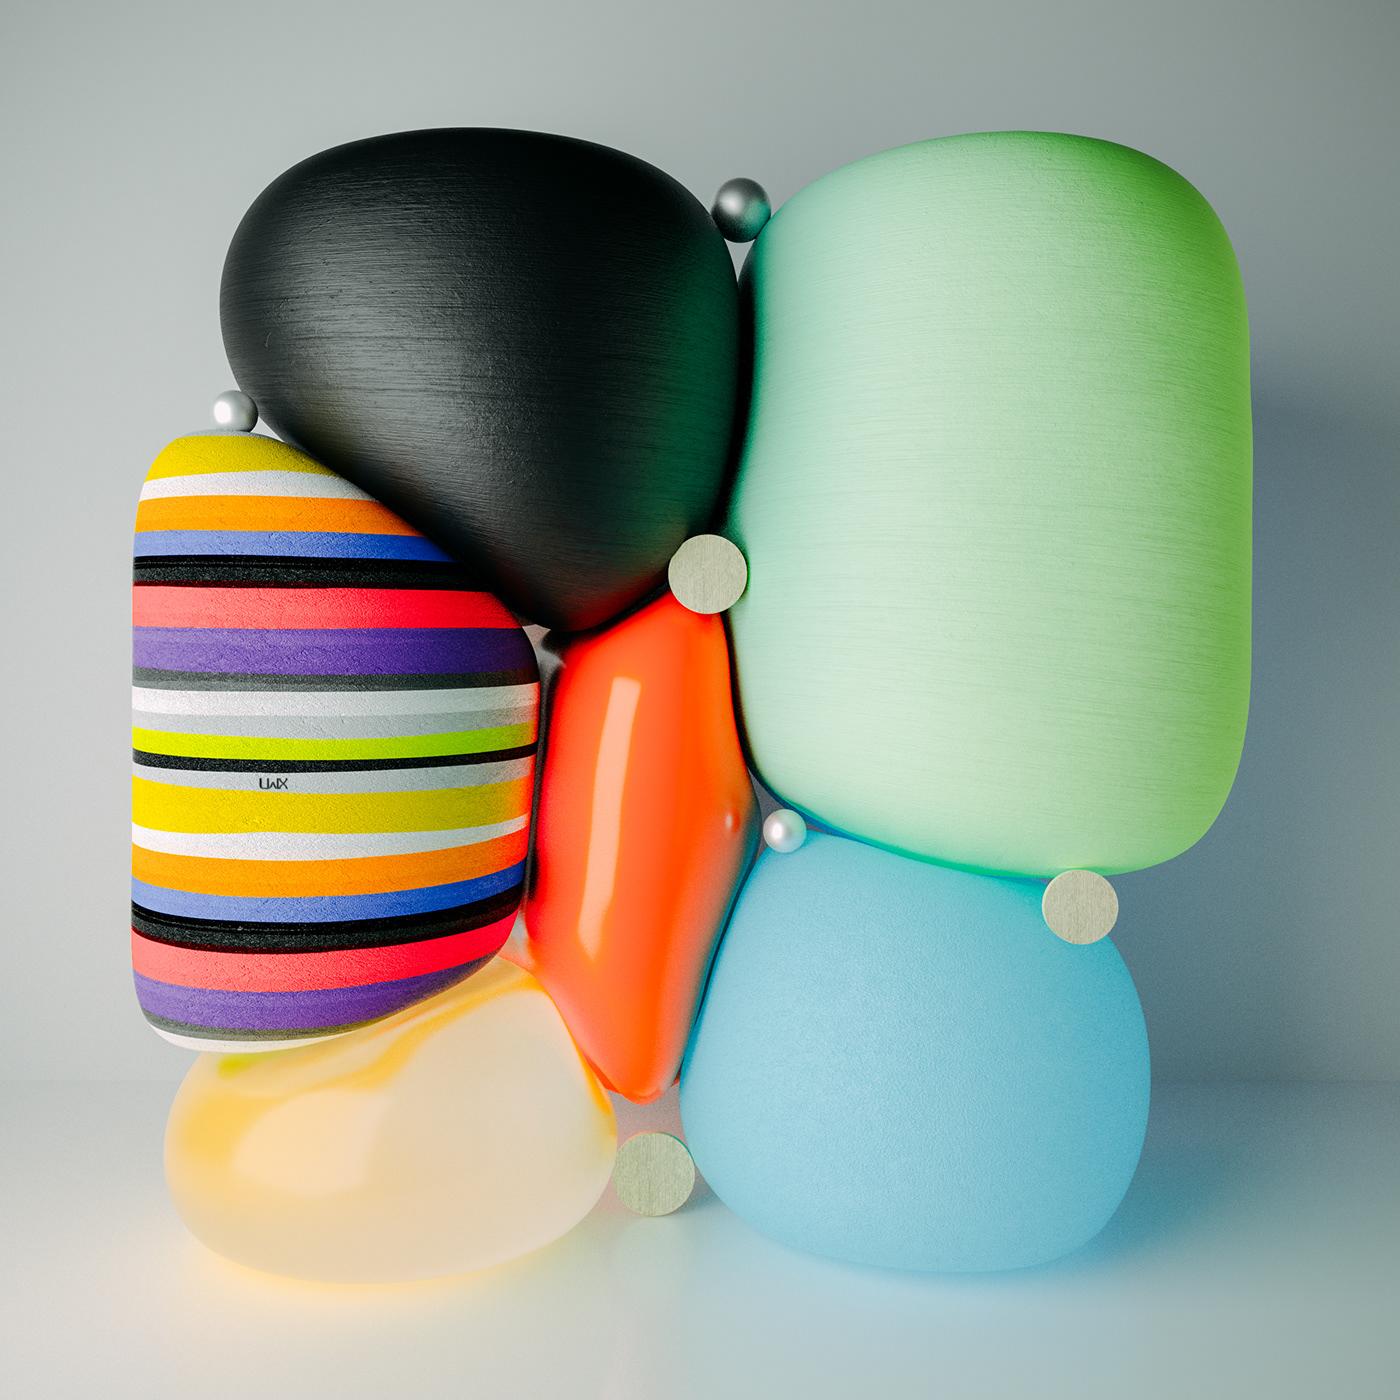 3dmotion 3dsculpture 3DType abstract handrawn moderndesign moods pantone Patterns